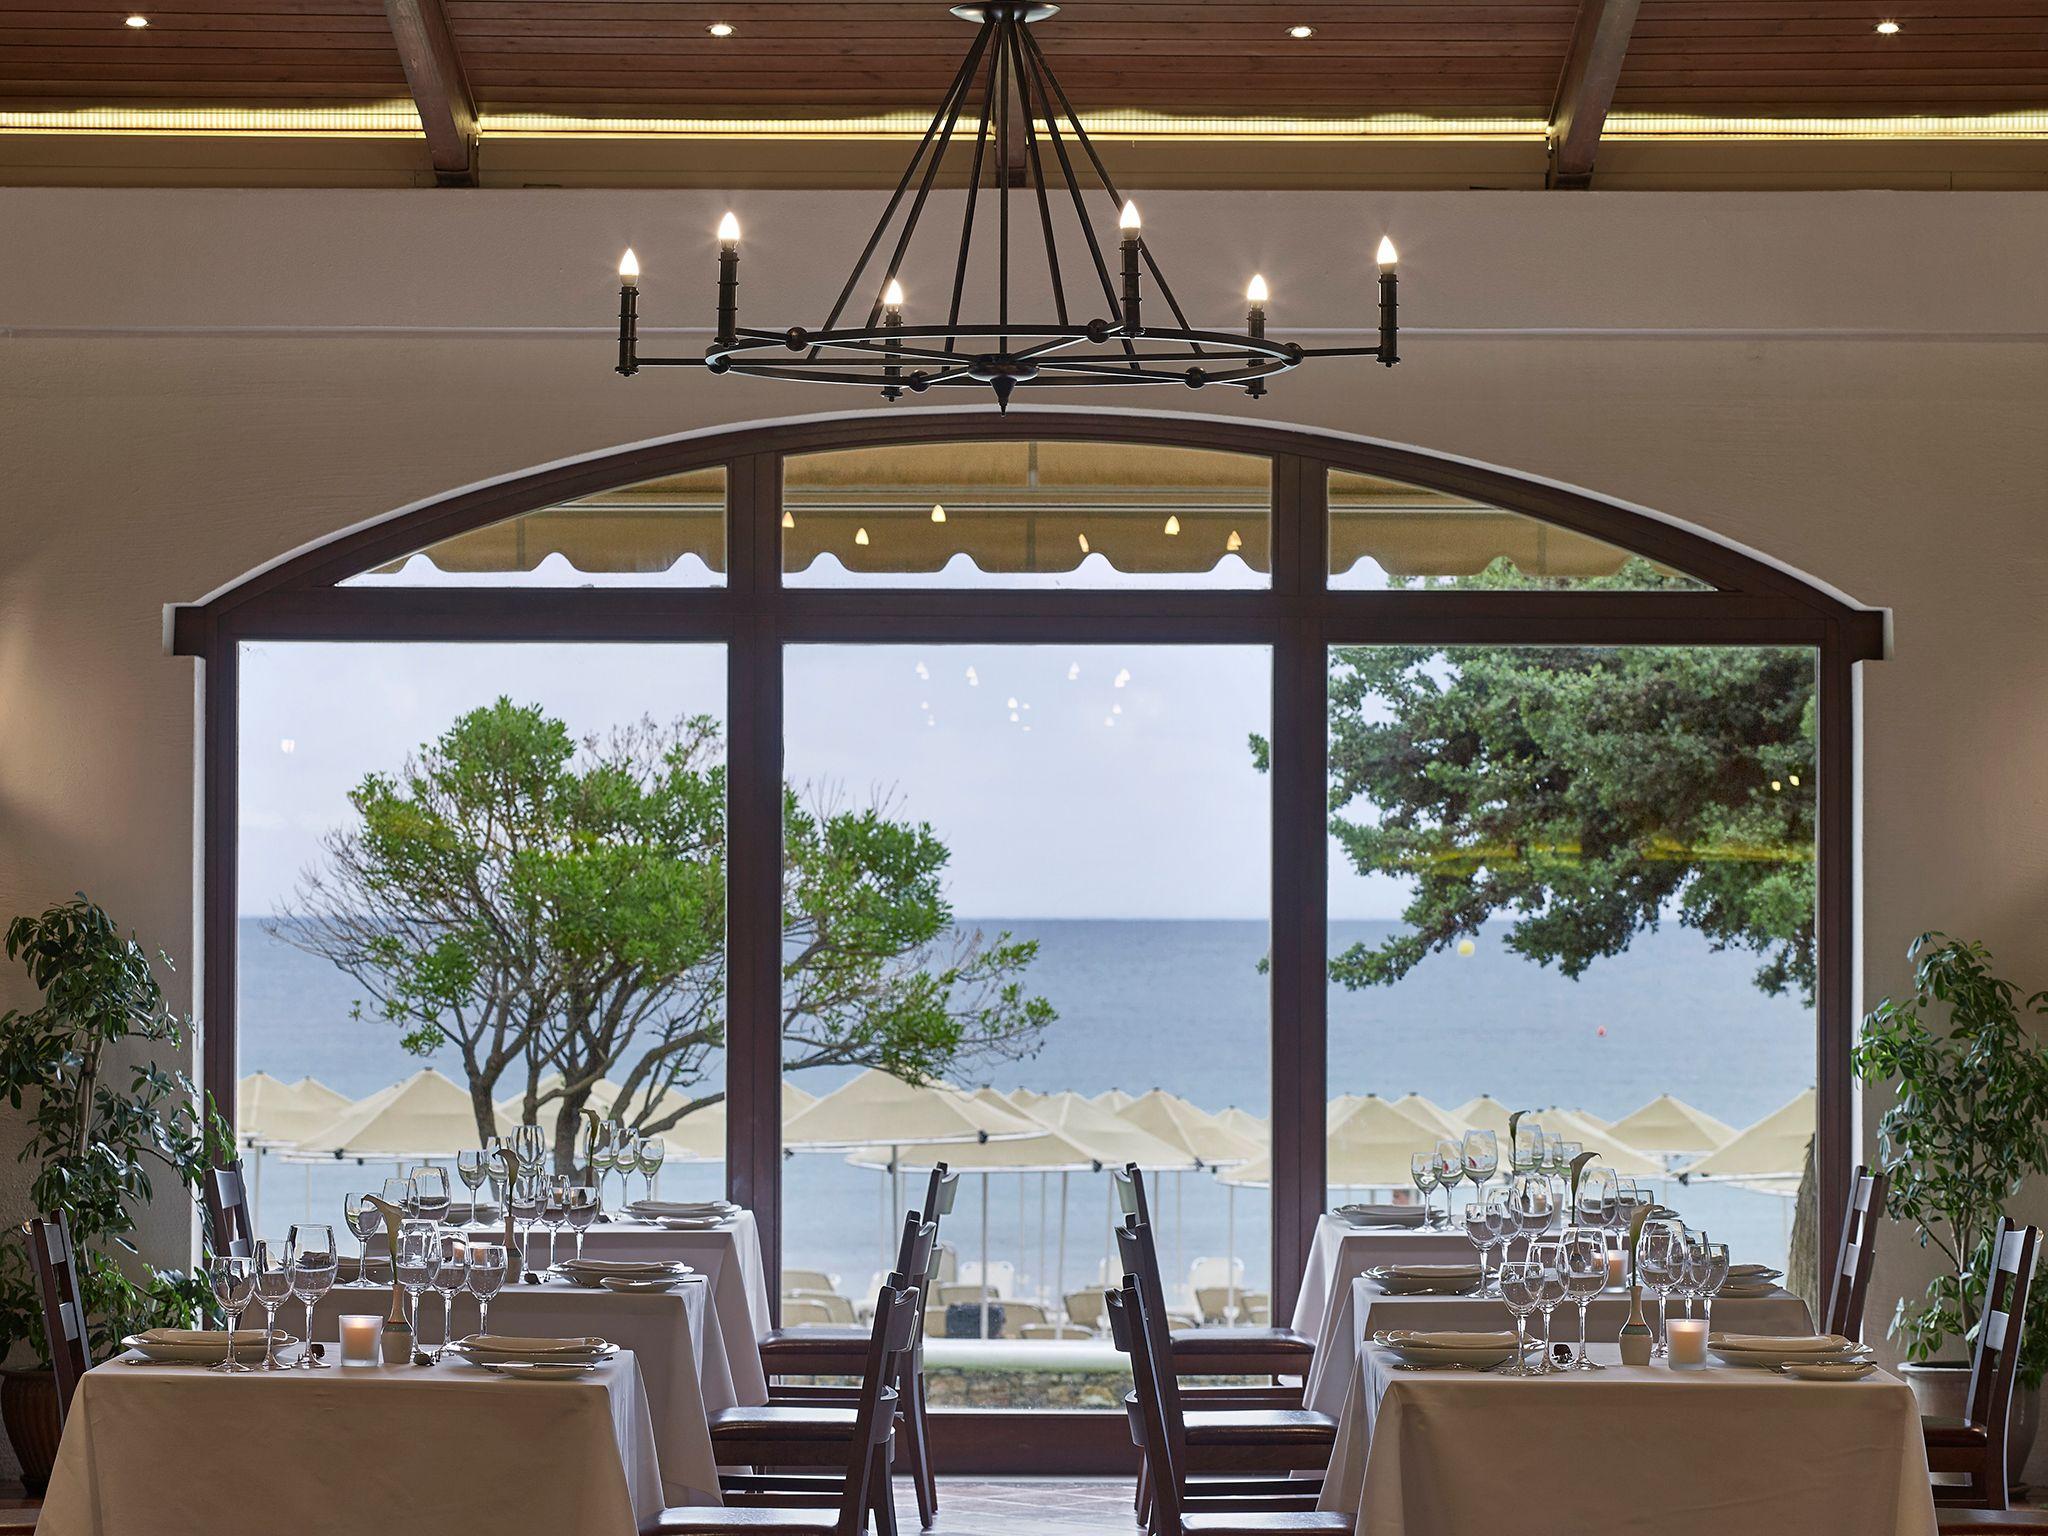 restauracja Cosmos, hotel Creta Maris, Kreta